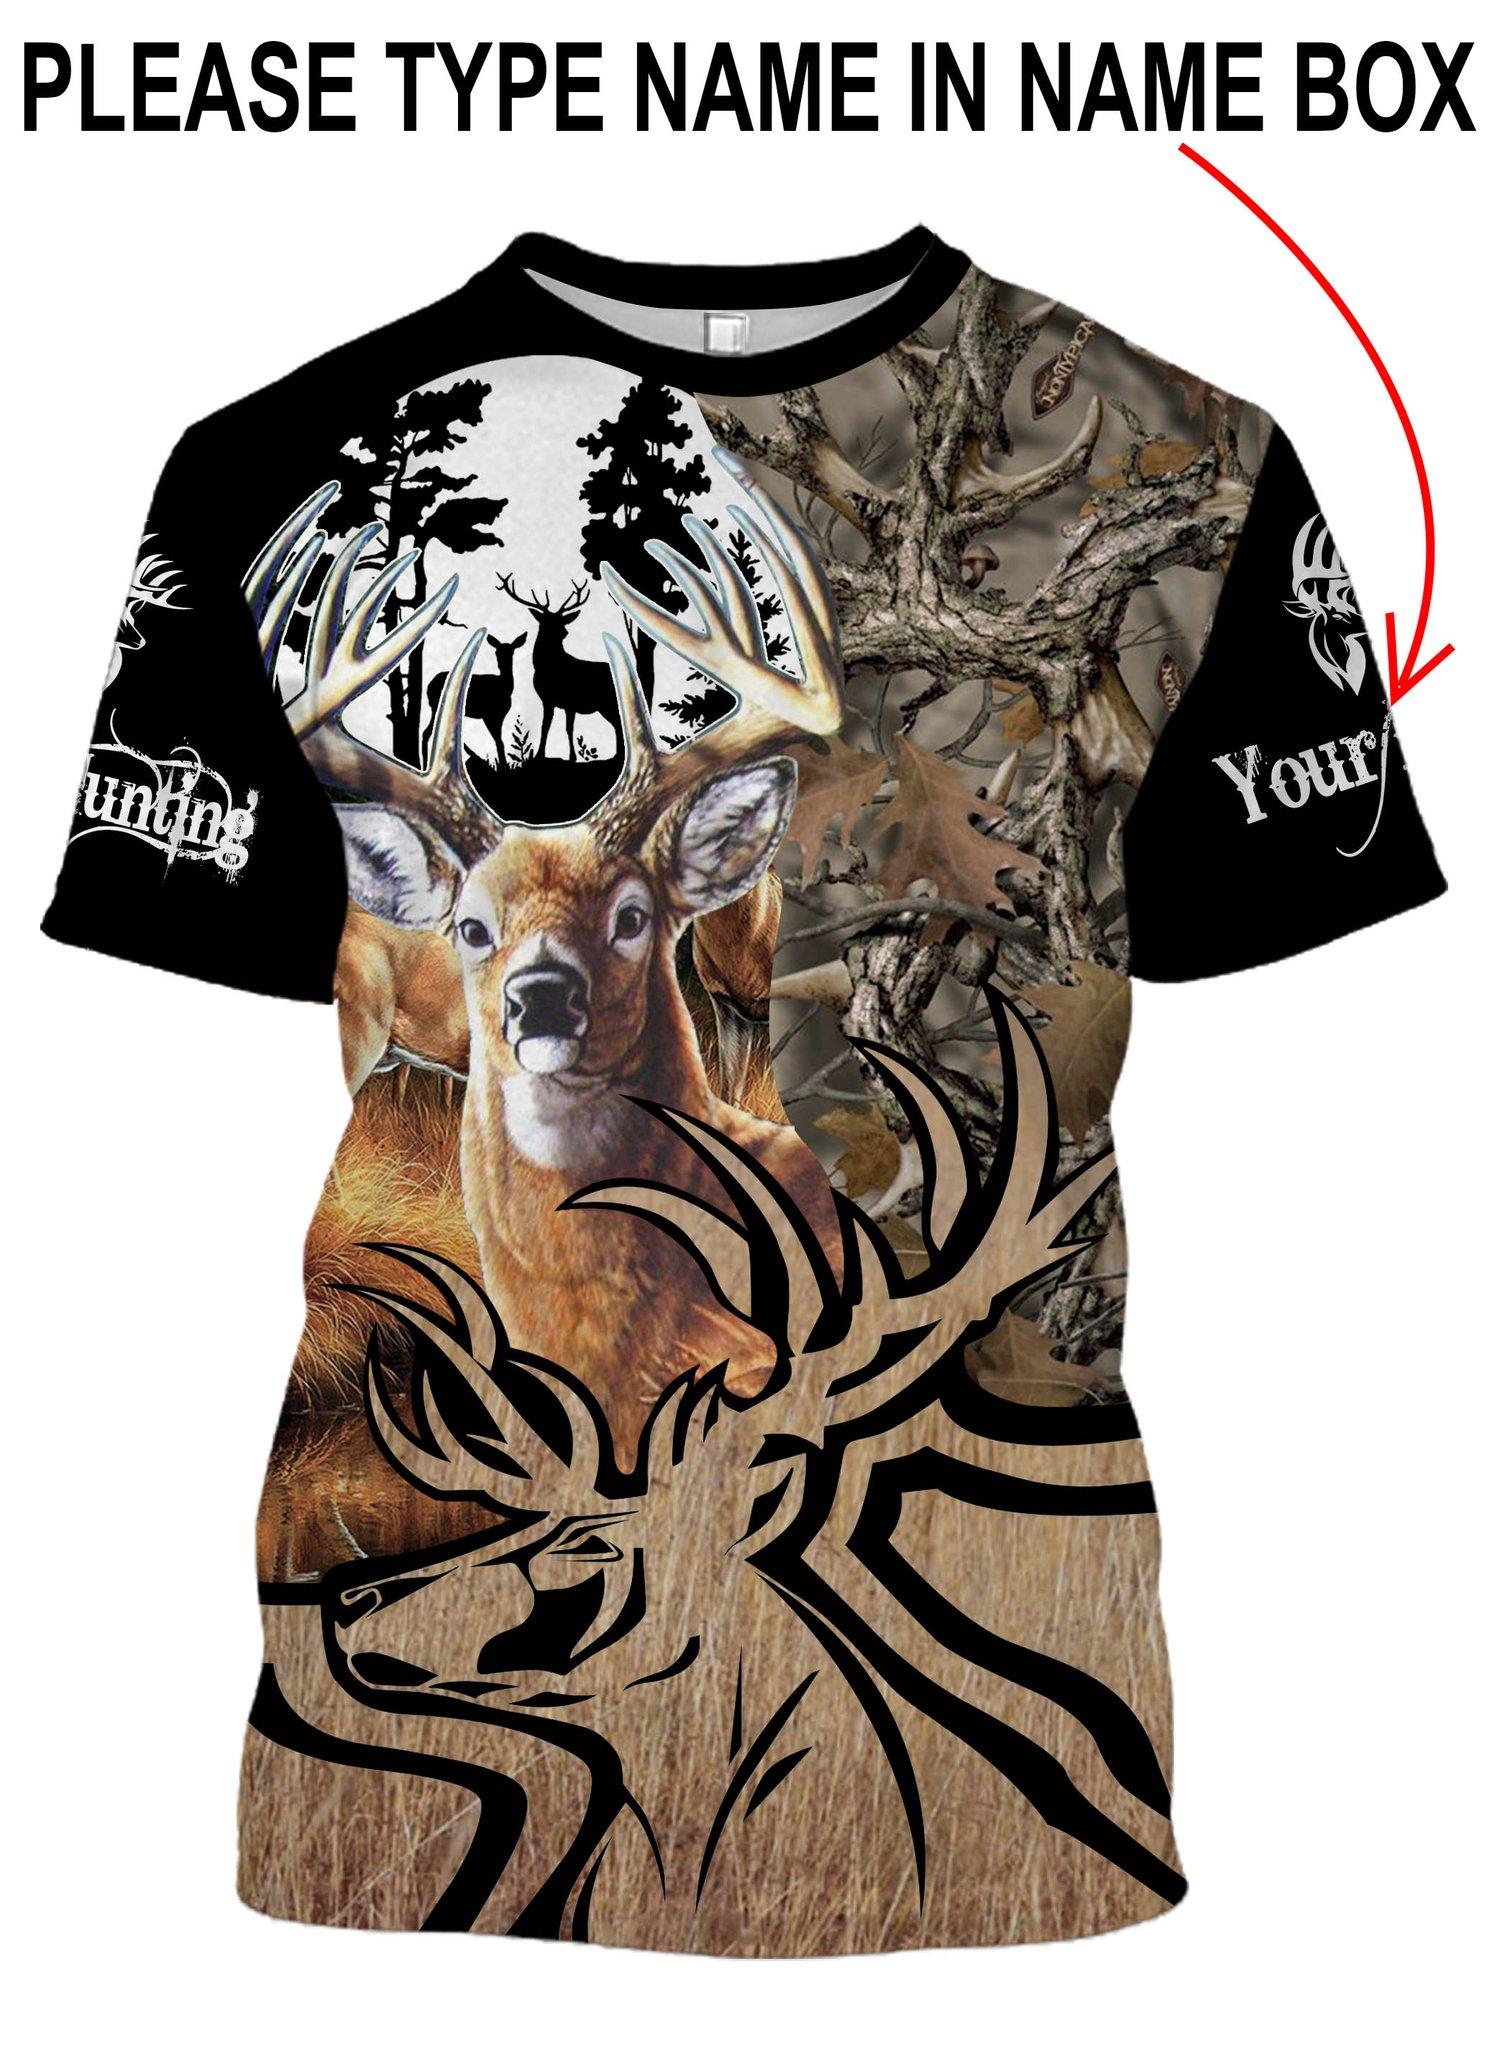 Deer hunting personalized full printing tshirt